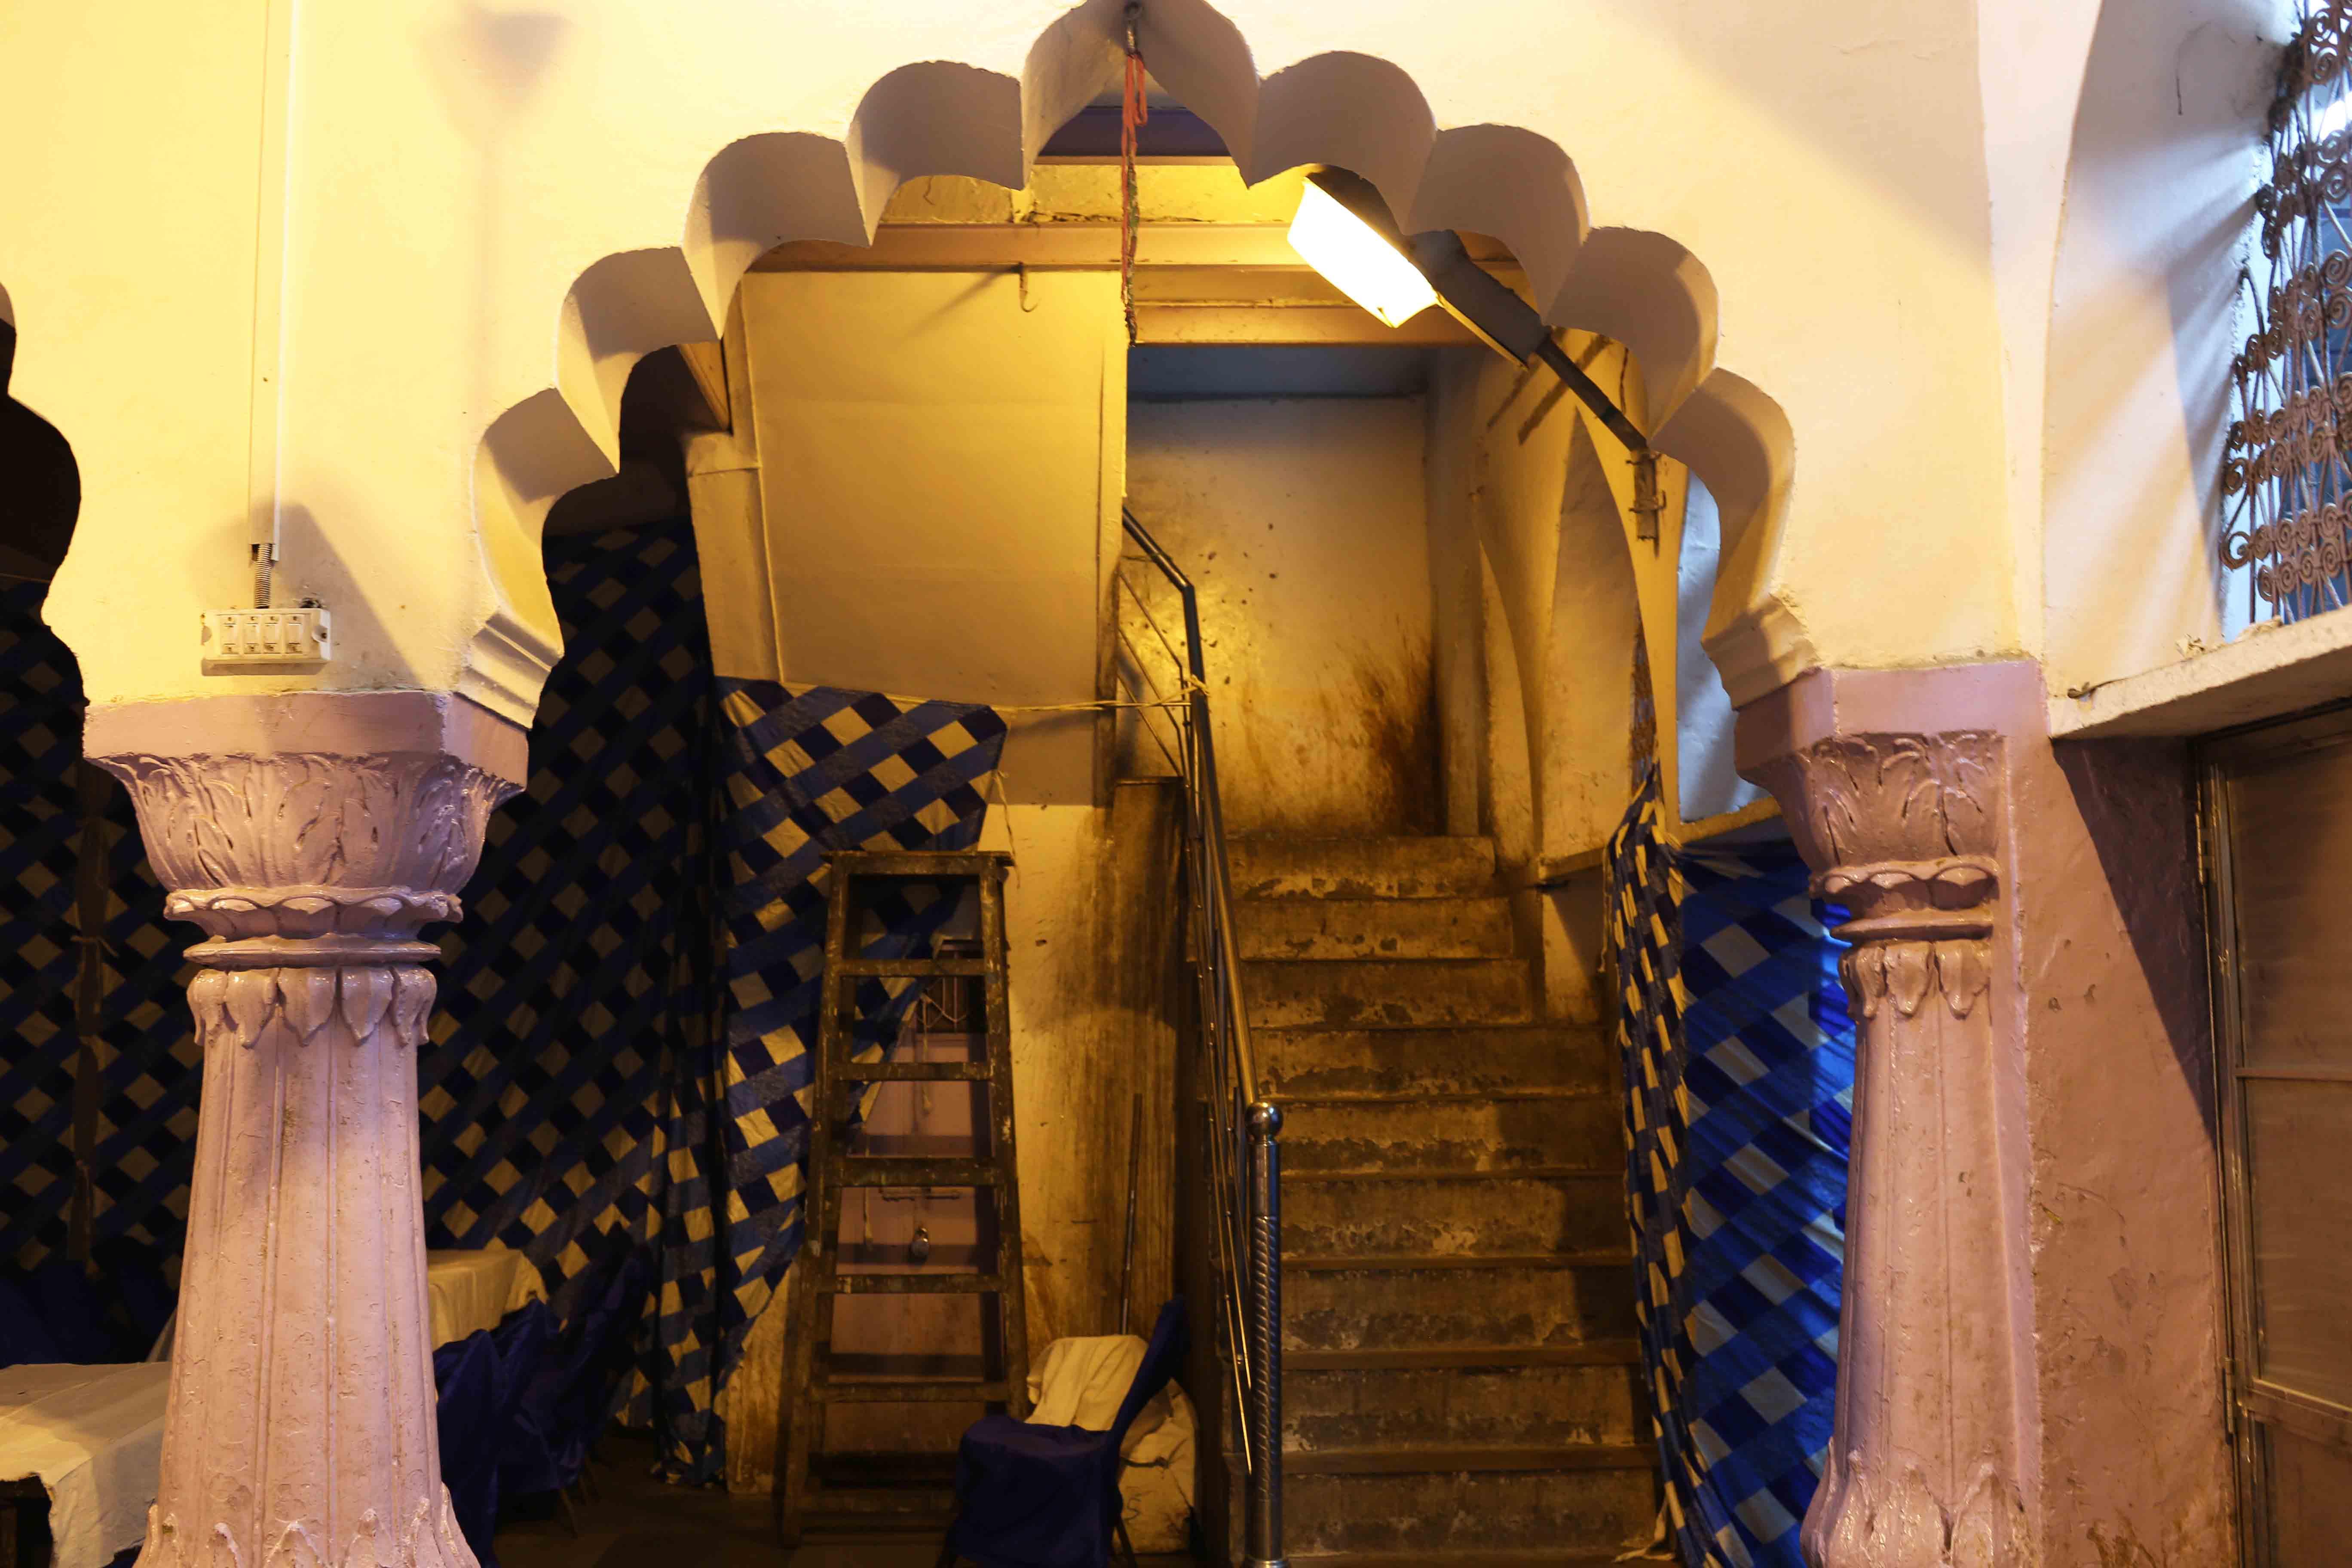 Photo Essay – The Empty Banquet Hall, Pahari Bhojla